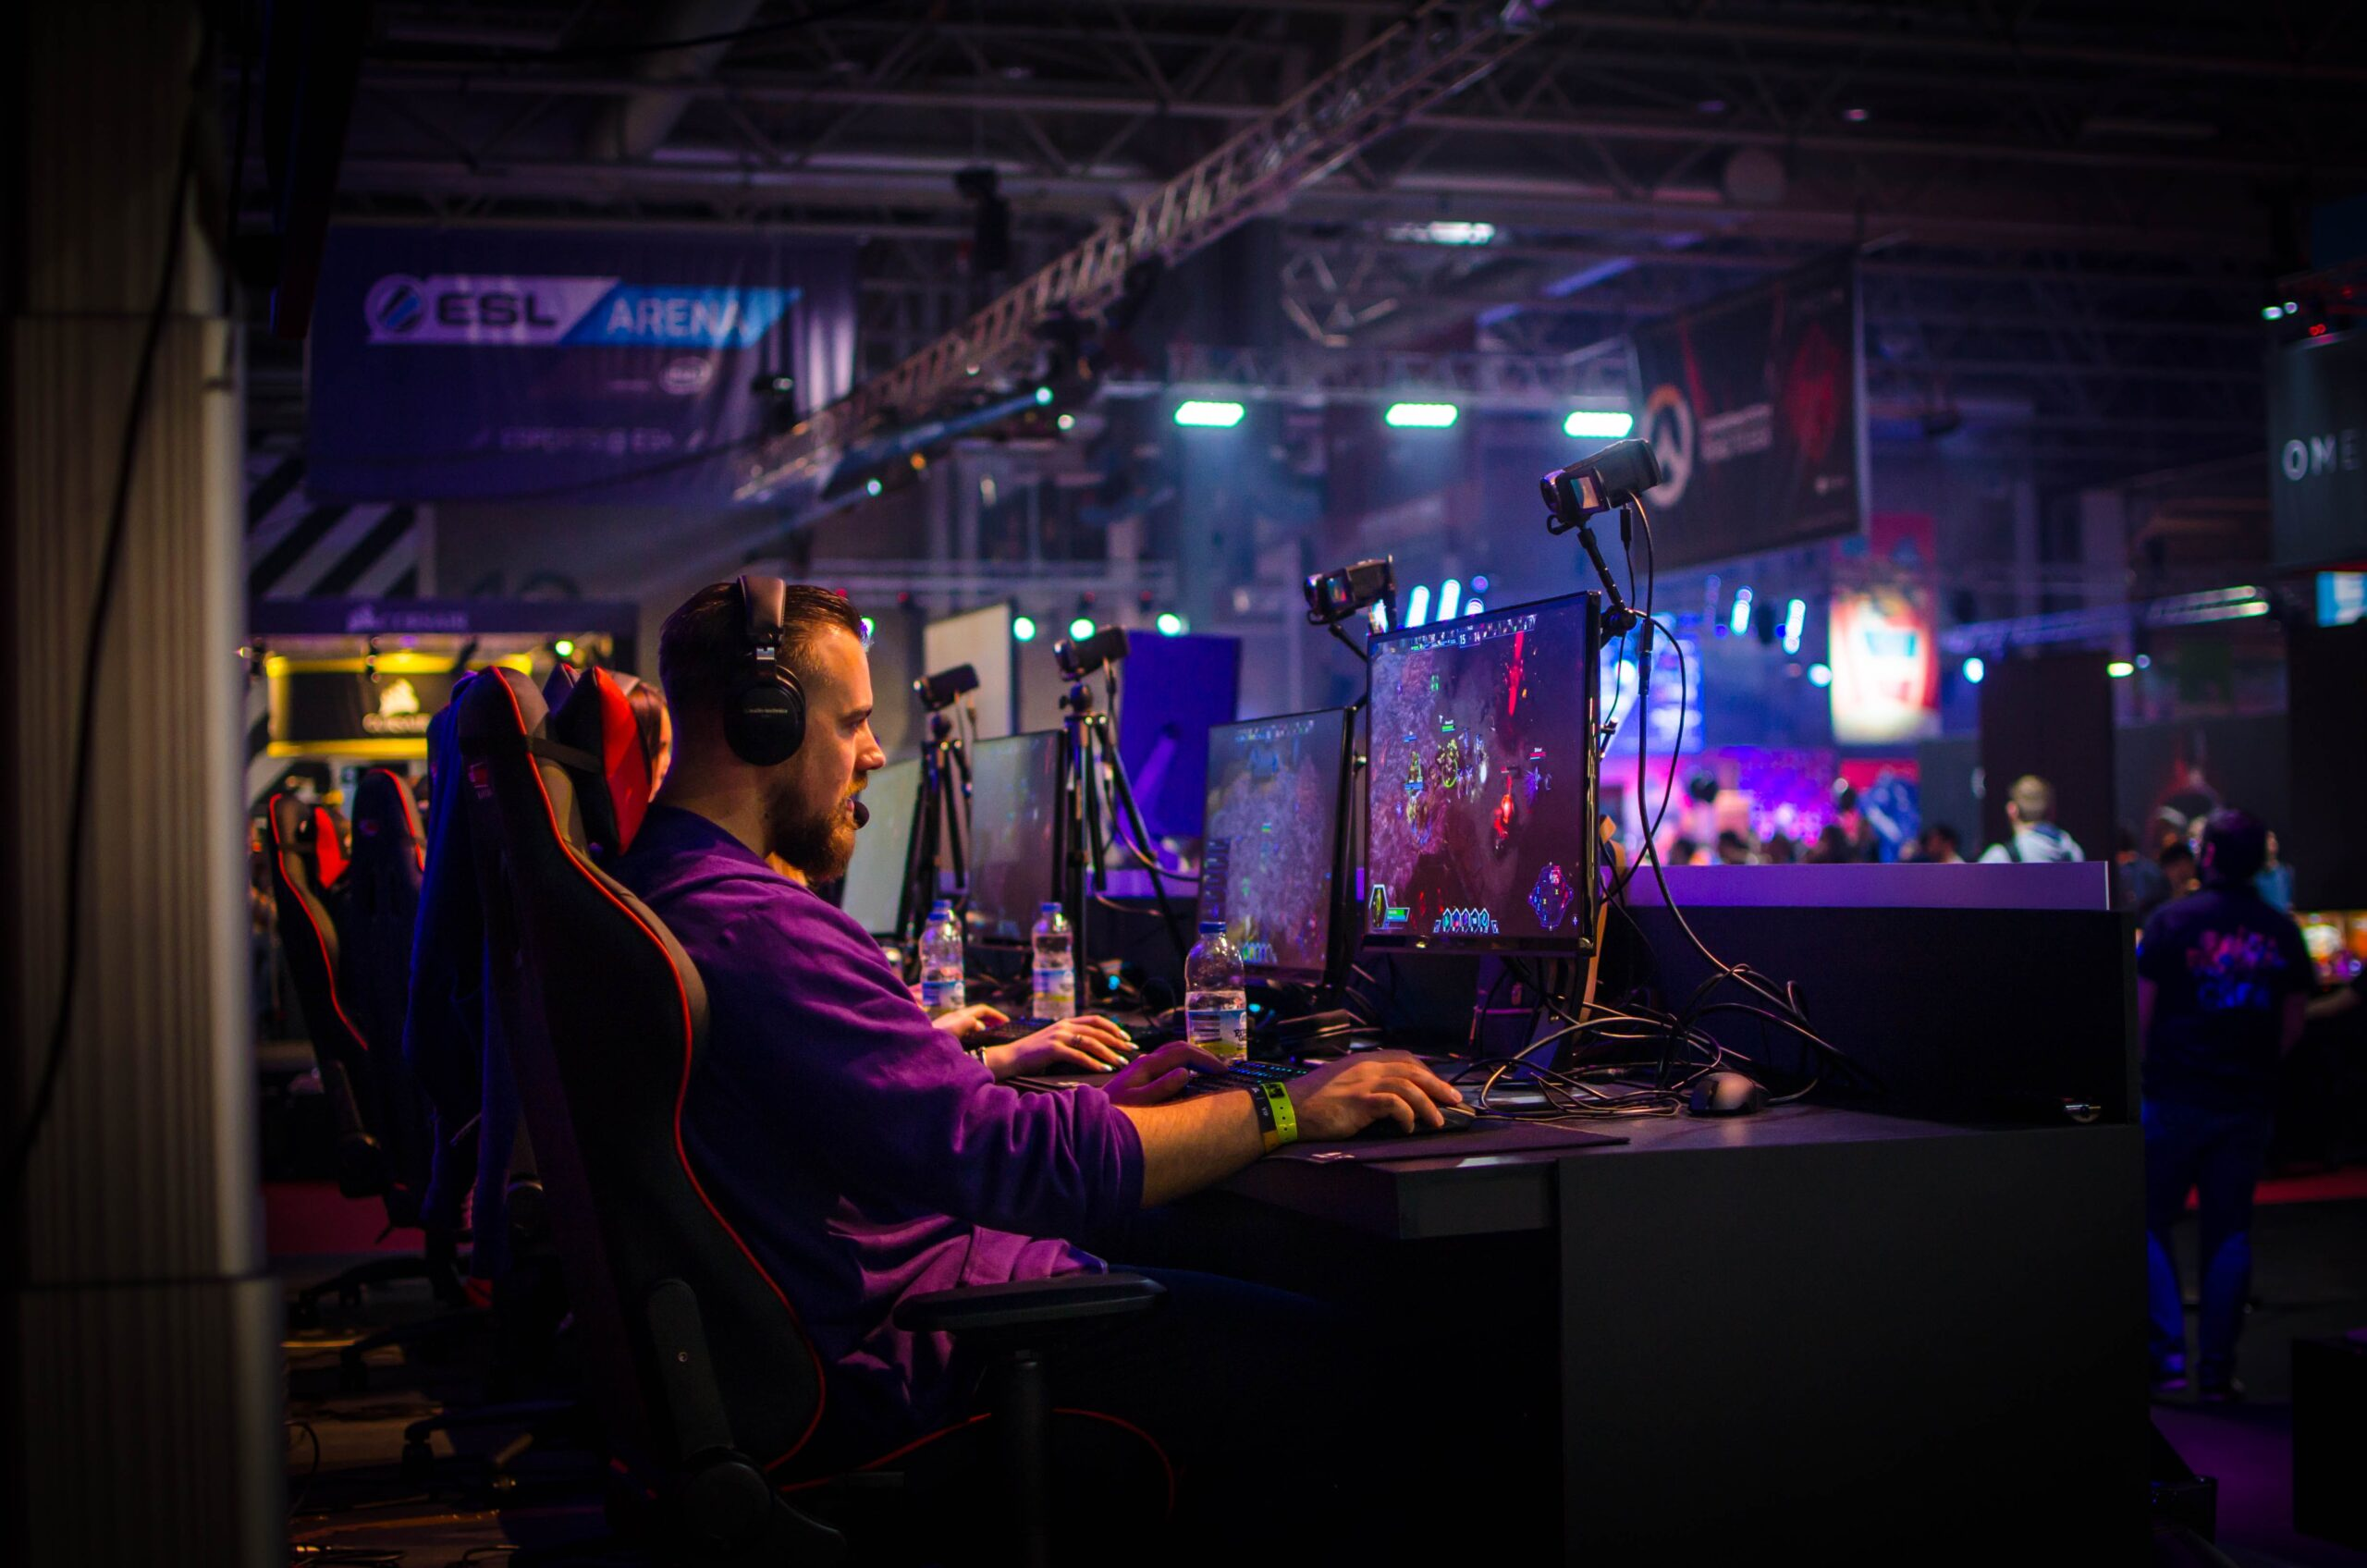 Welche Gadget nutzen eSports-Profis? (Foto: Pexels)